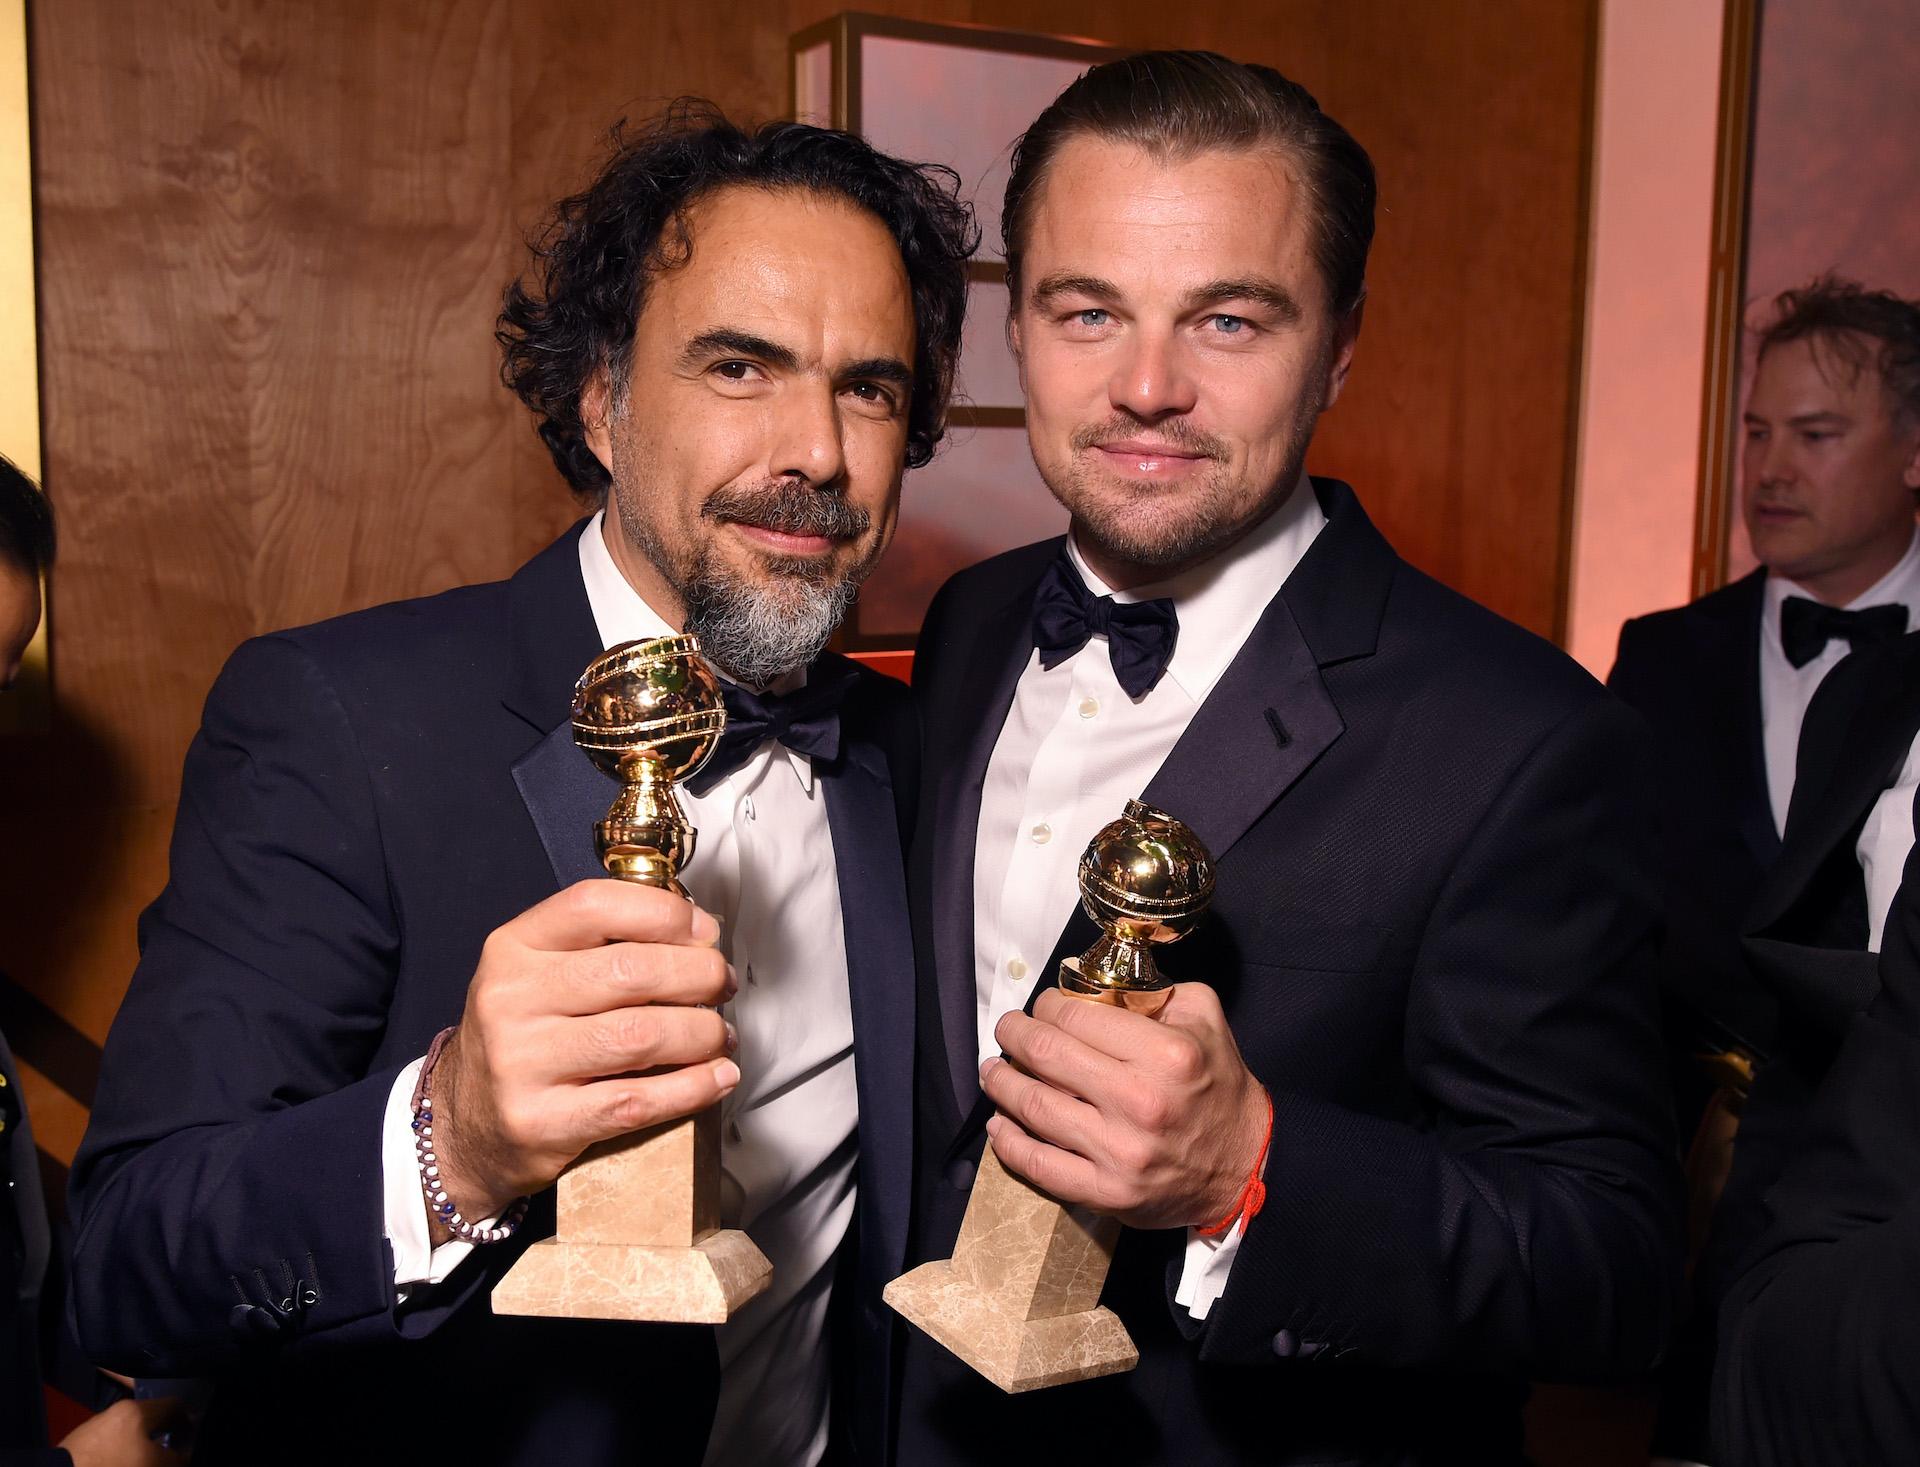 The 2016 Golden Globe Winning Movies